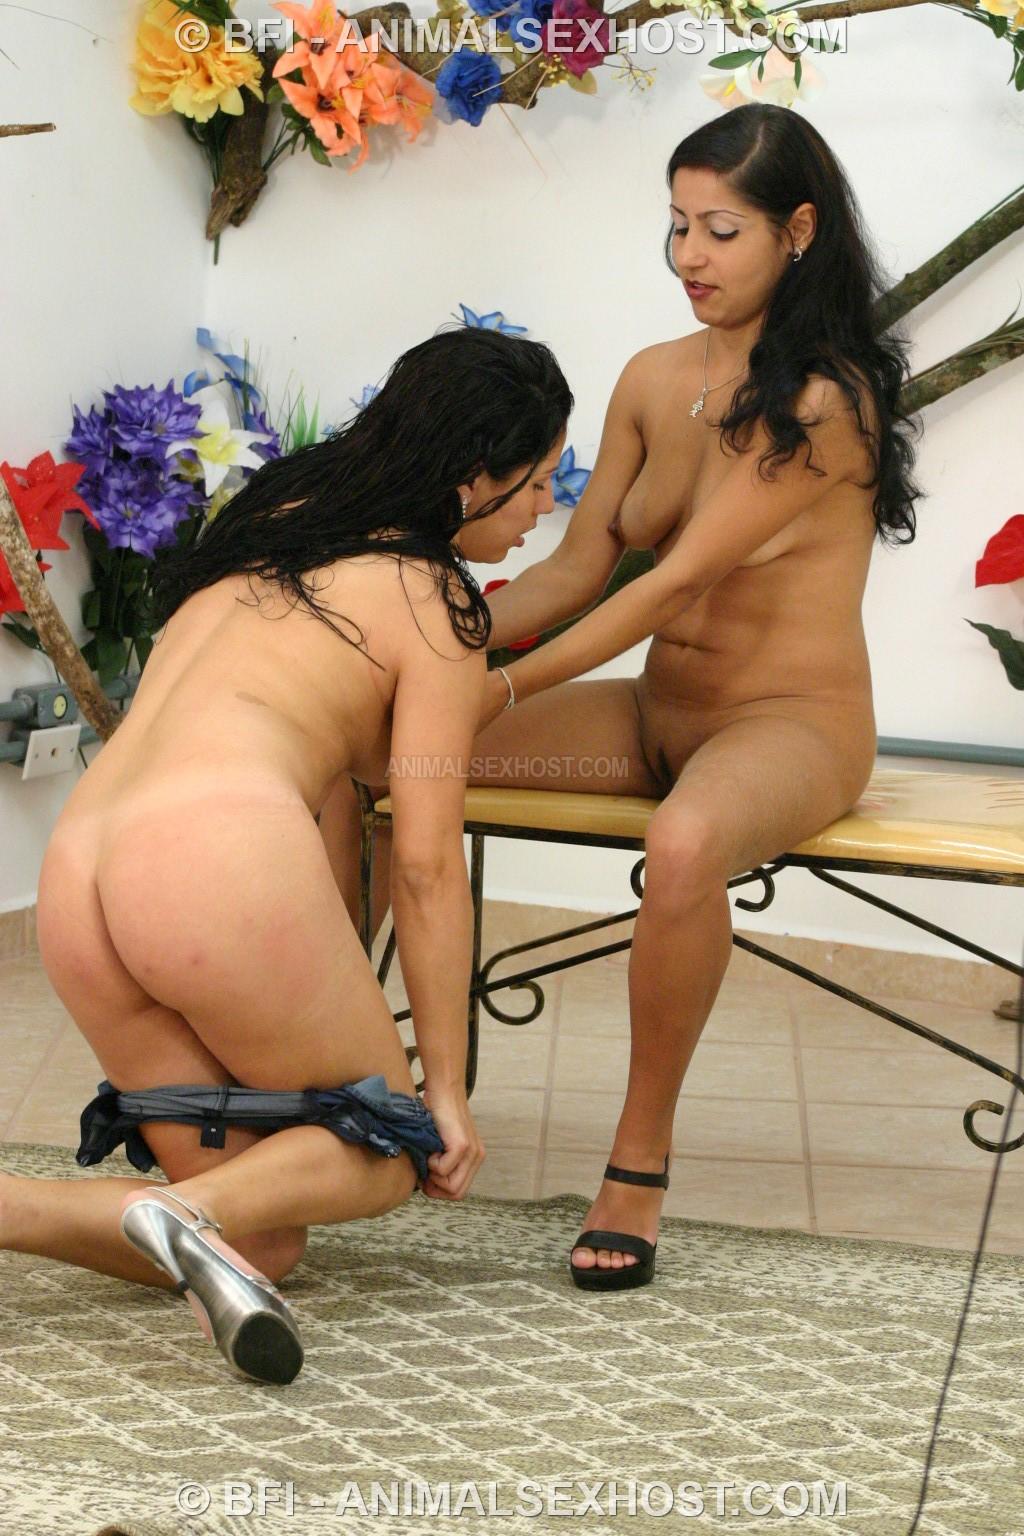 Dogsex Show Monica, Kelly And Kimberly  Free Animalsex -4599